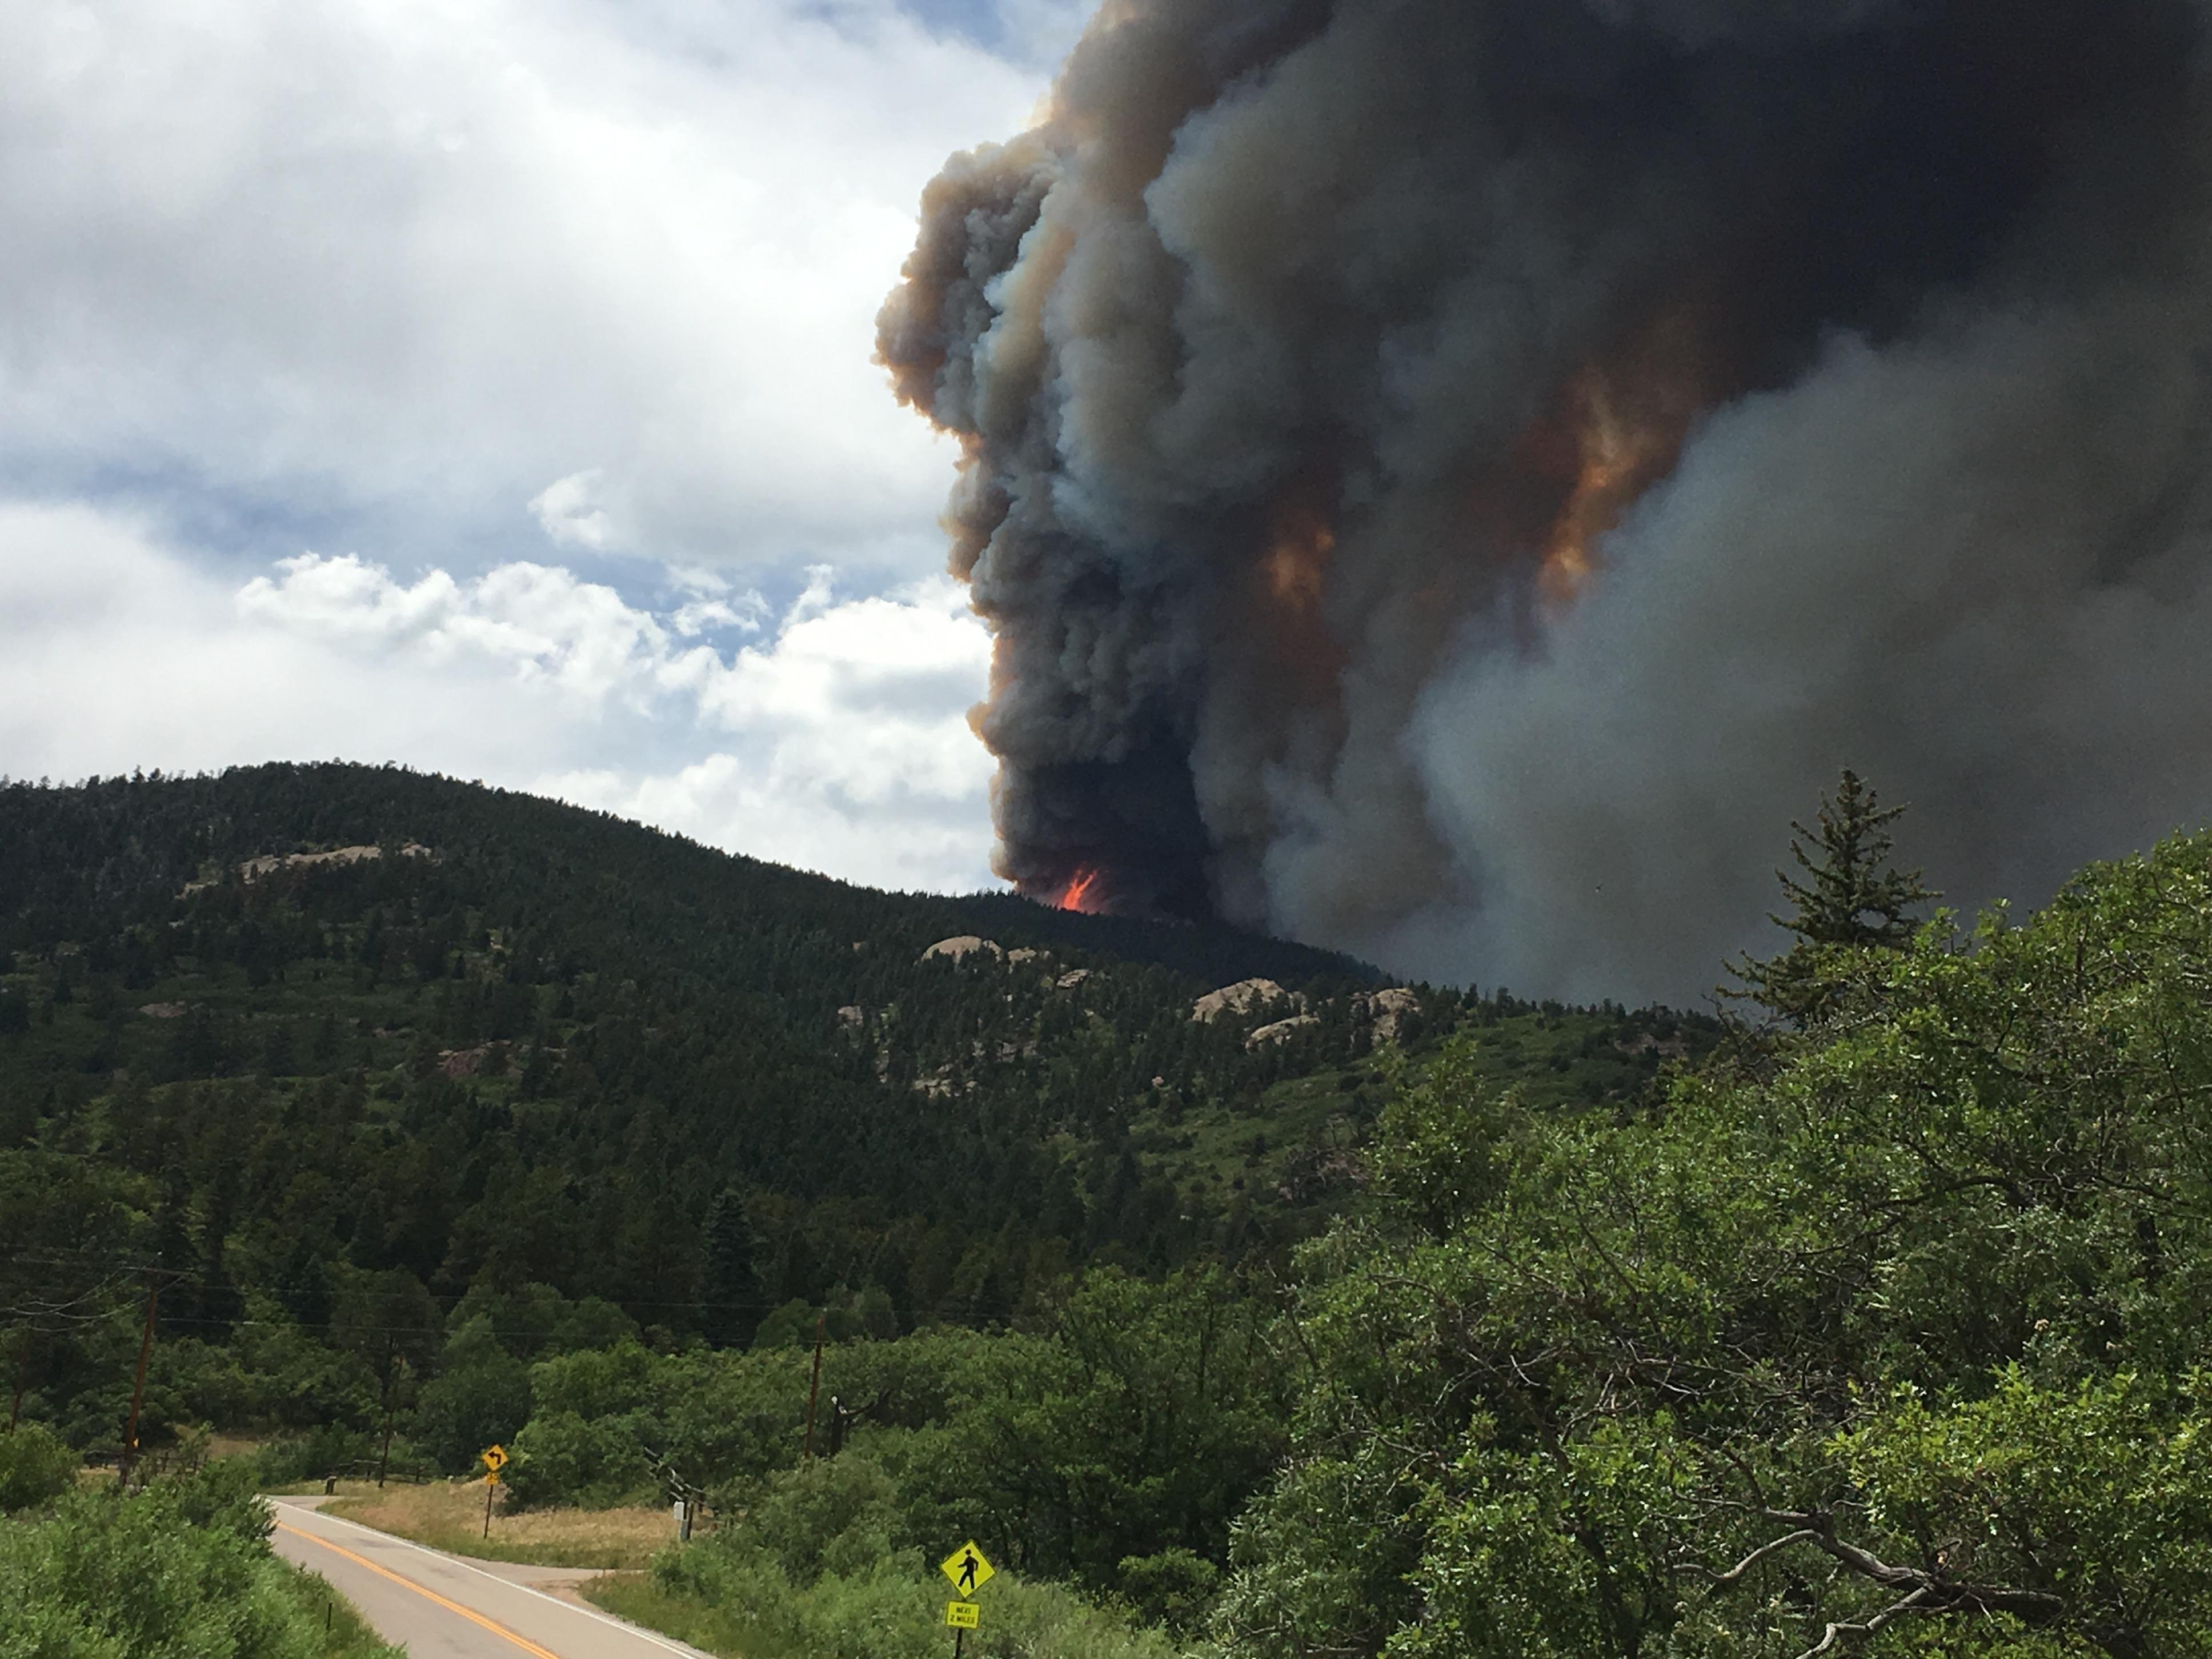 July2_Spring Fire_Cuchara_CO 12_Flames.JPG